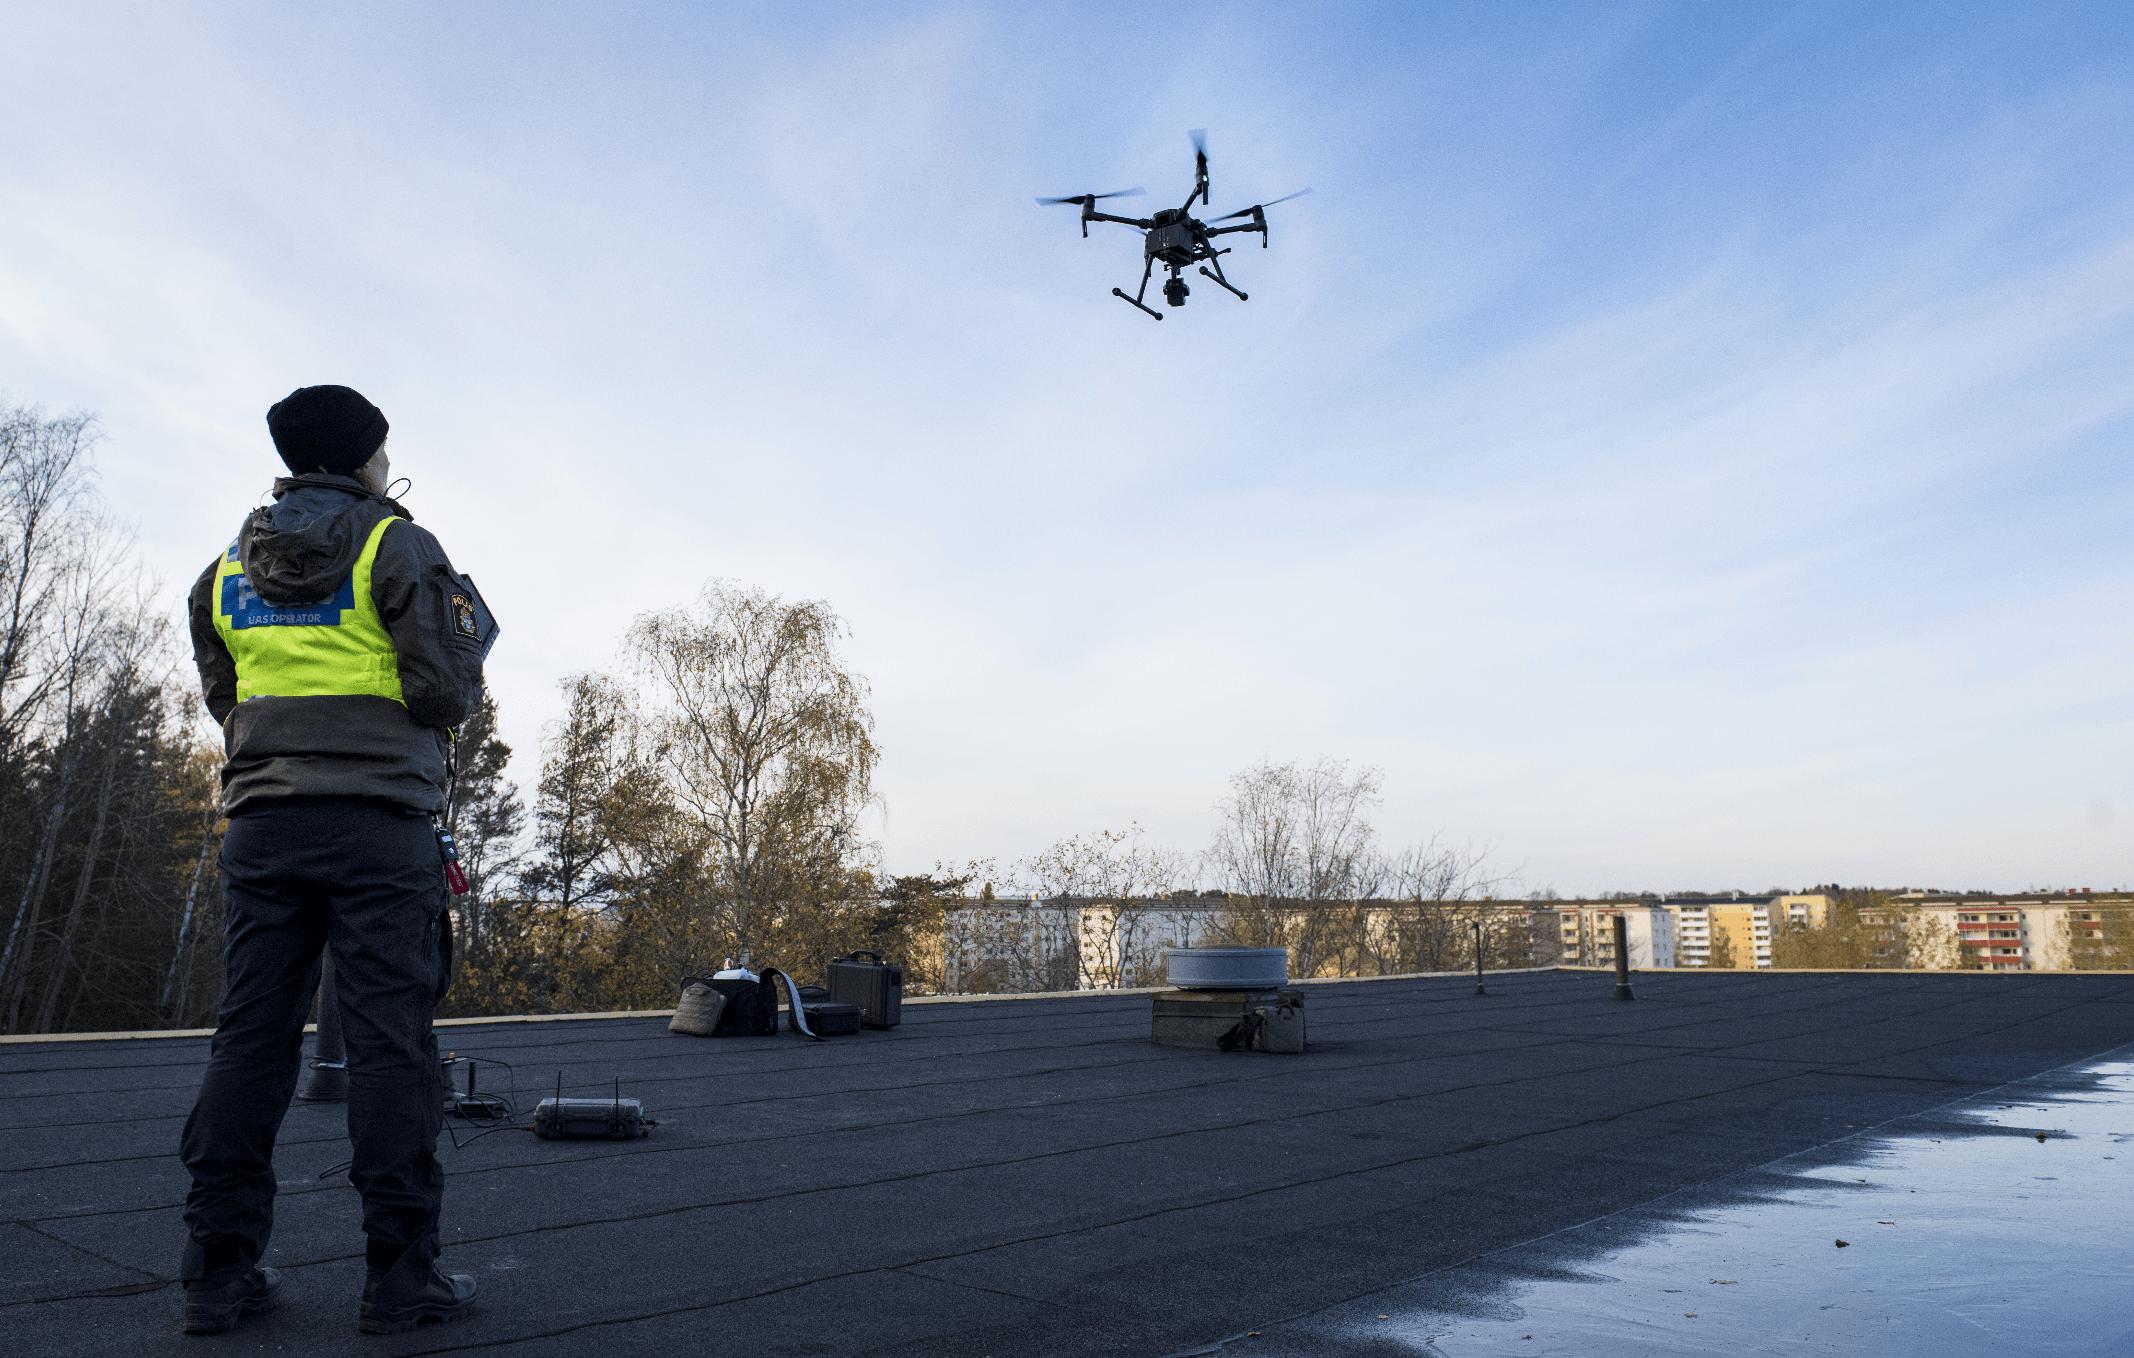 Swedish police using drones